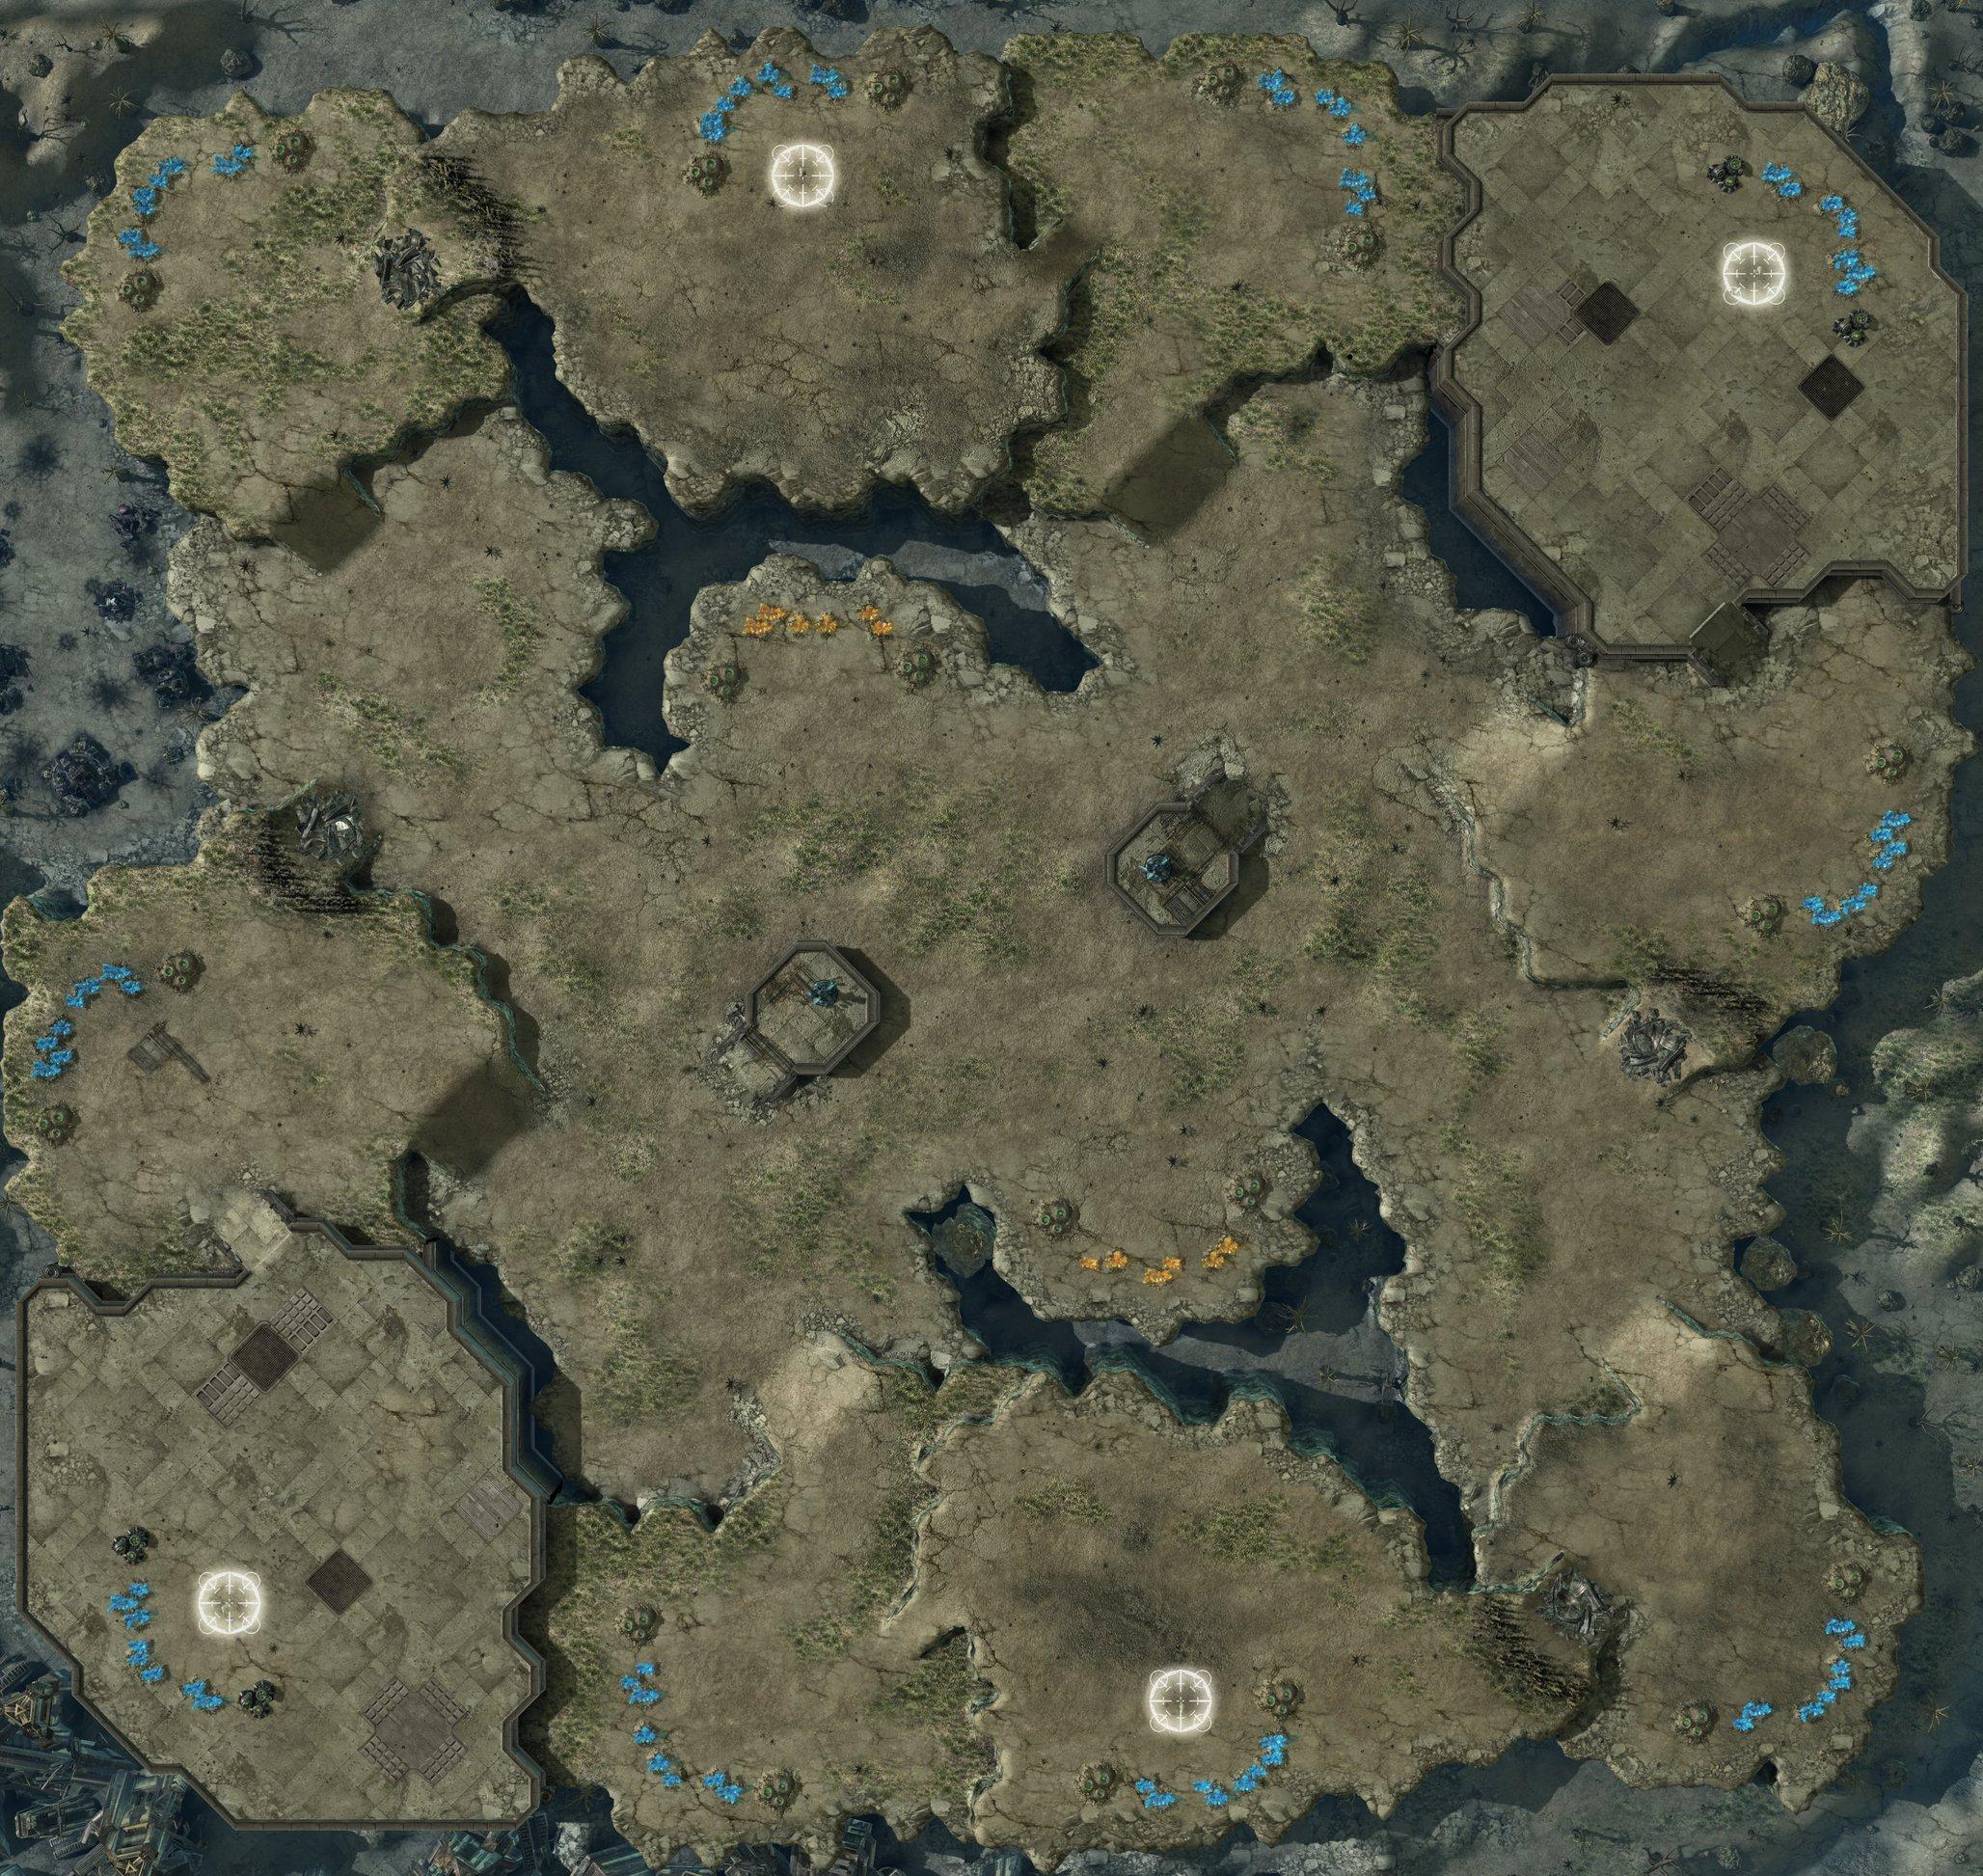 Starcraft 2 Maps Index of /bordel/Starcraft 2/Maps/2v2/ Starcraft 2 Maps